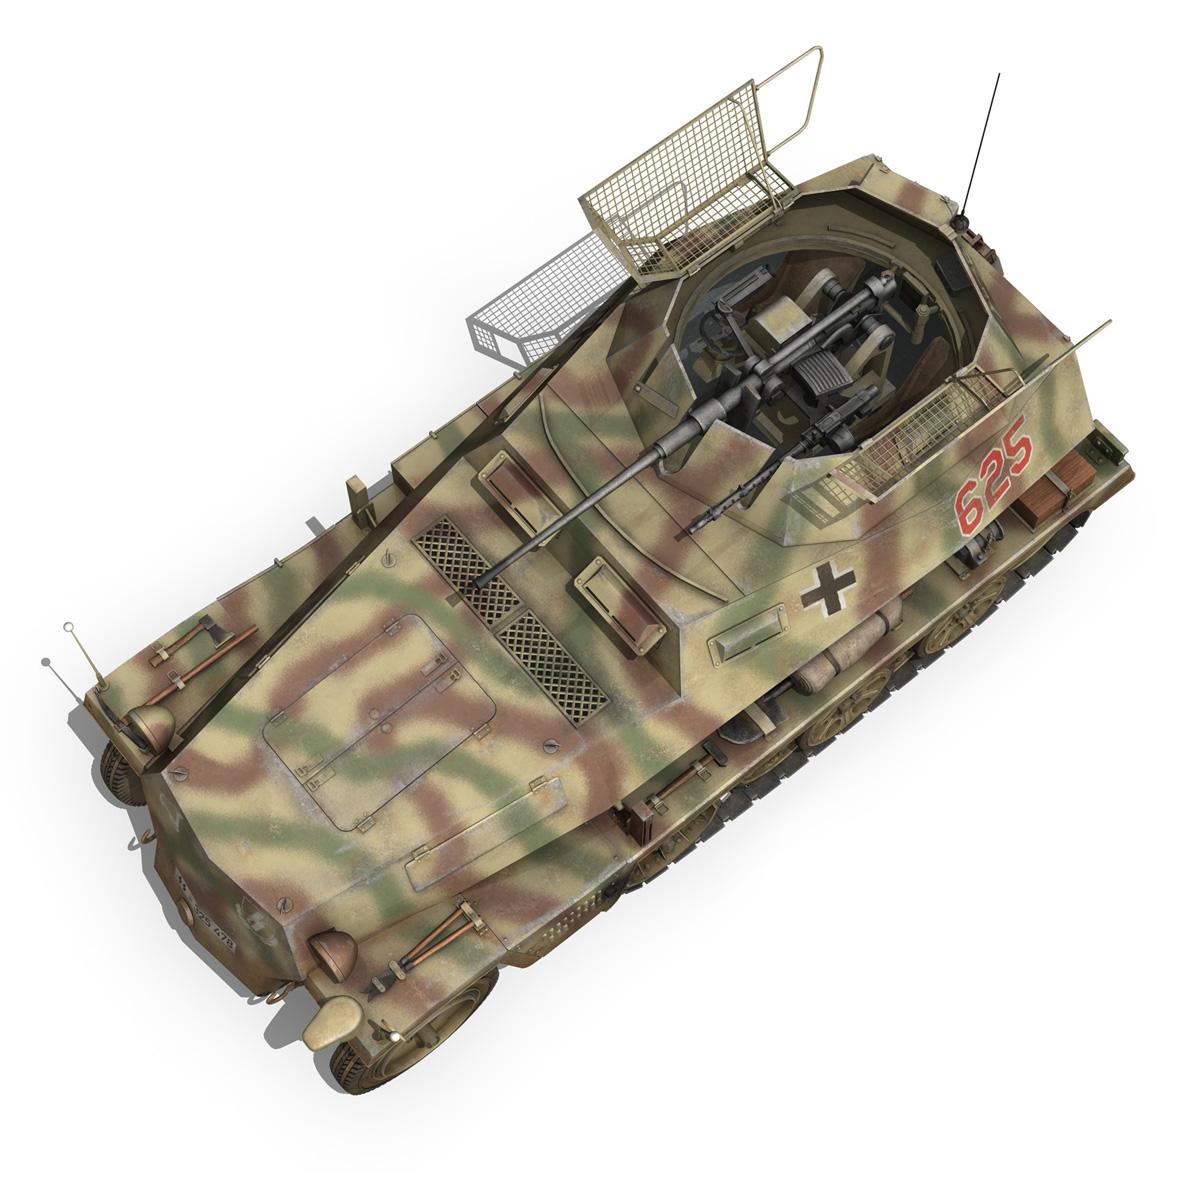 sd.kfz 250 9 – half-track armored vehicle 3d model 3ds fbx c4d lwo obj 198219